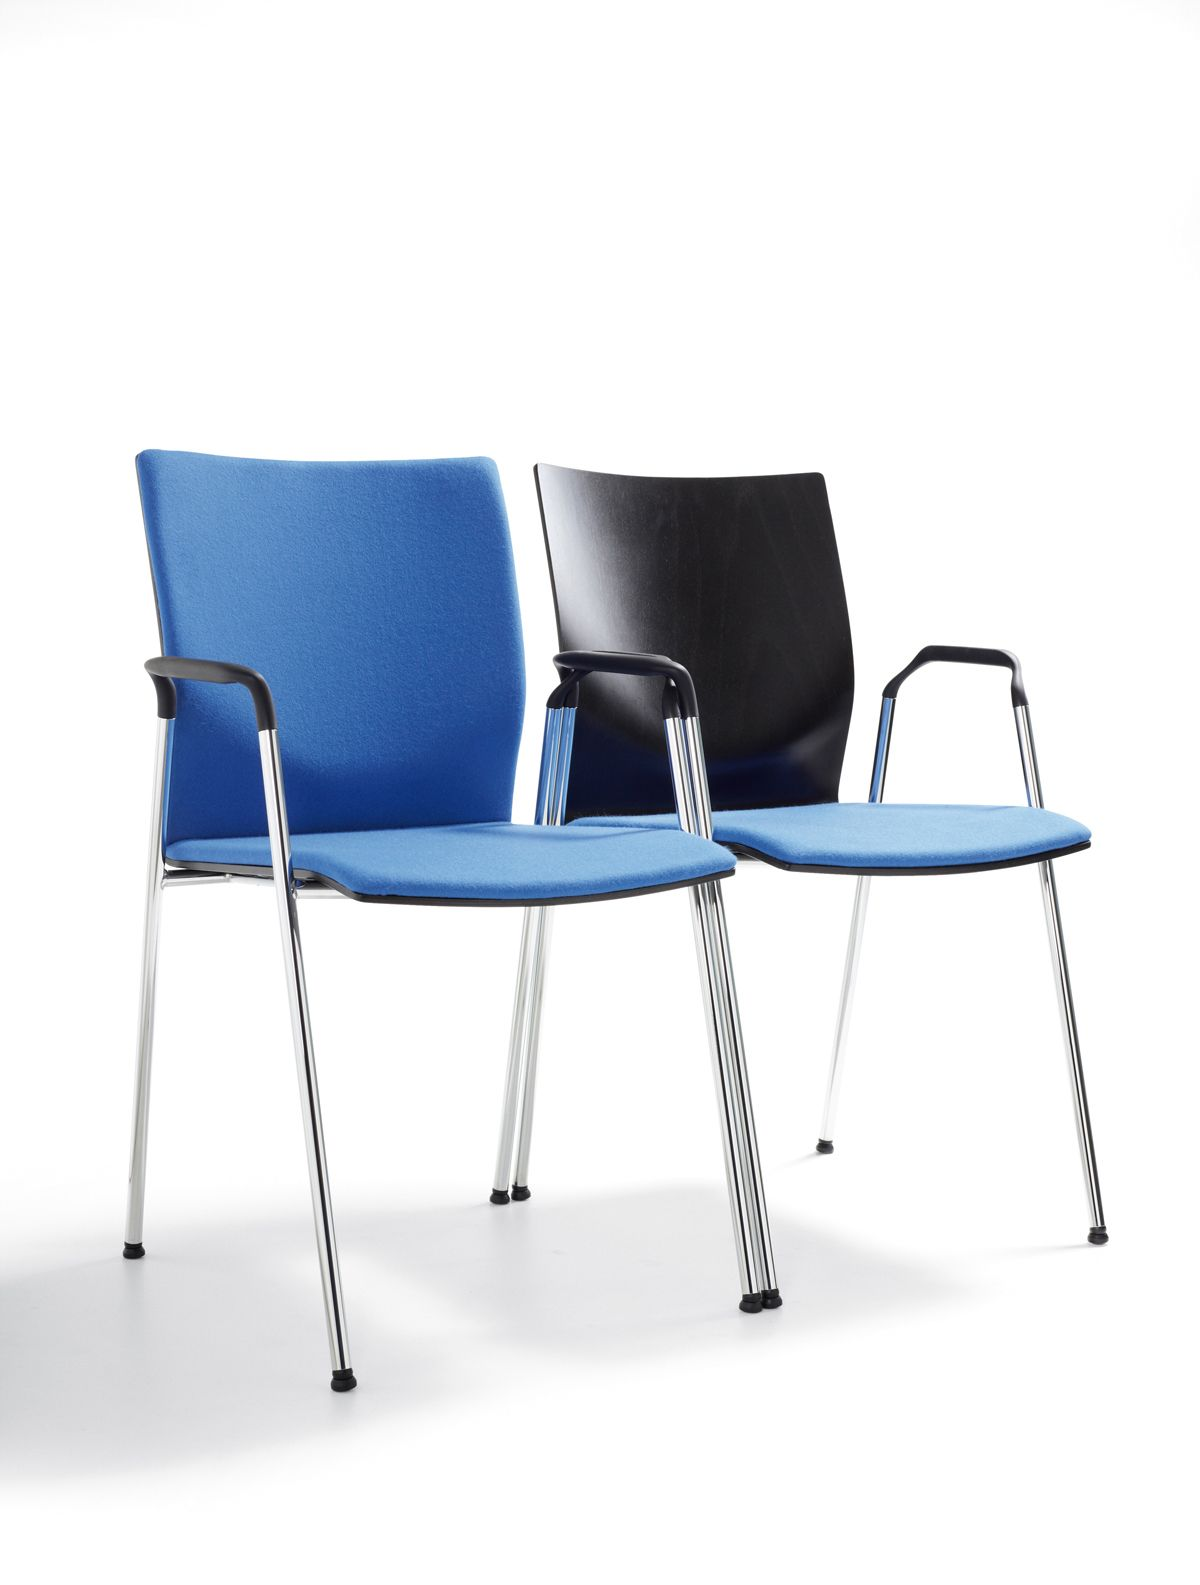 Flow chair by Lande, separately or linked together, the arms have been designed to enable very compact linking  Flow stoel van Lande, Los geplaatst of gekoppeld in zaalopstelling Flow •  Designer: Martin Ballendat • © Lande • Photo: Studio van Assendelft